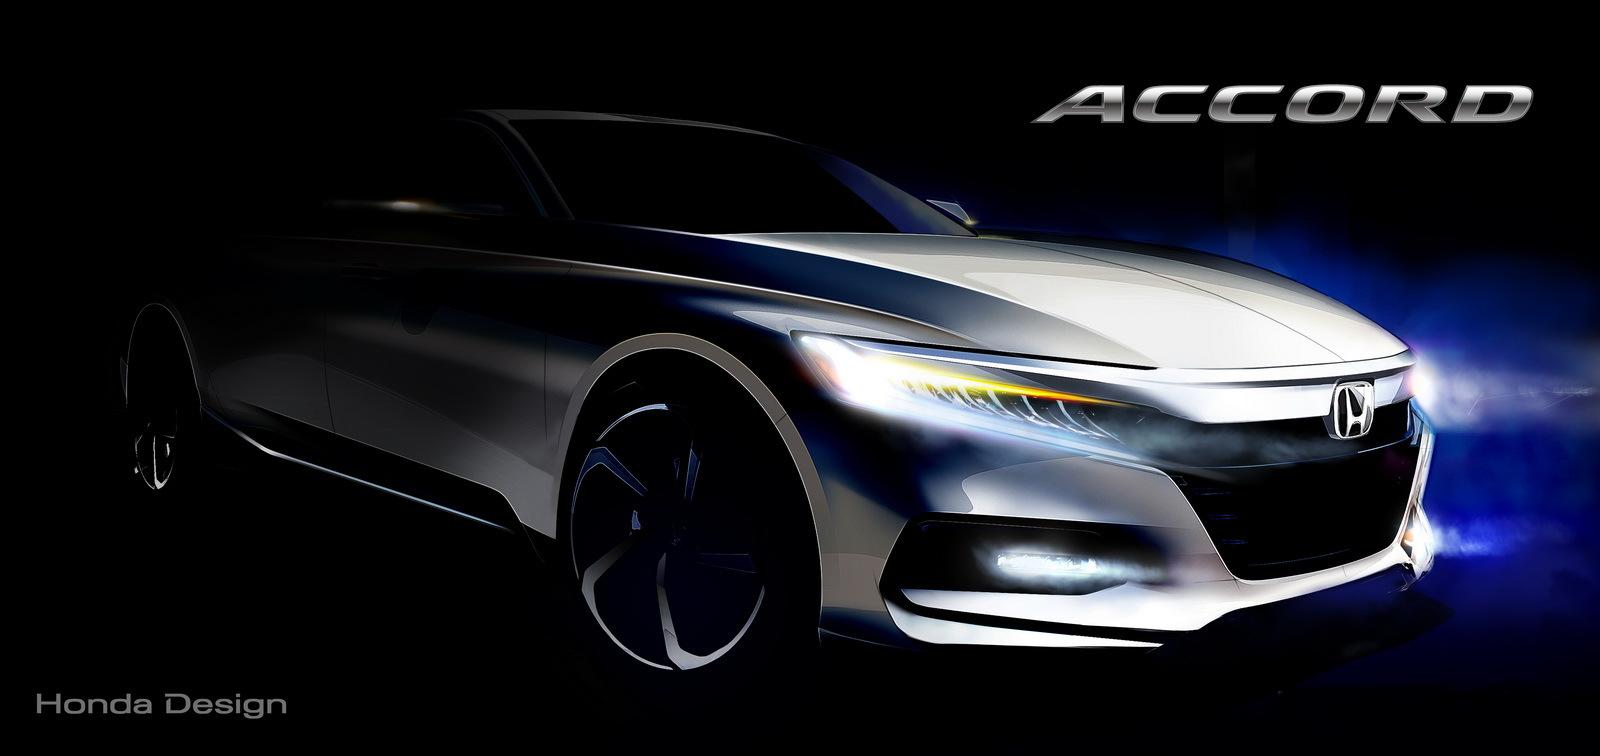 2018-Honda-Accord-Concept-Sketch.jpg